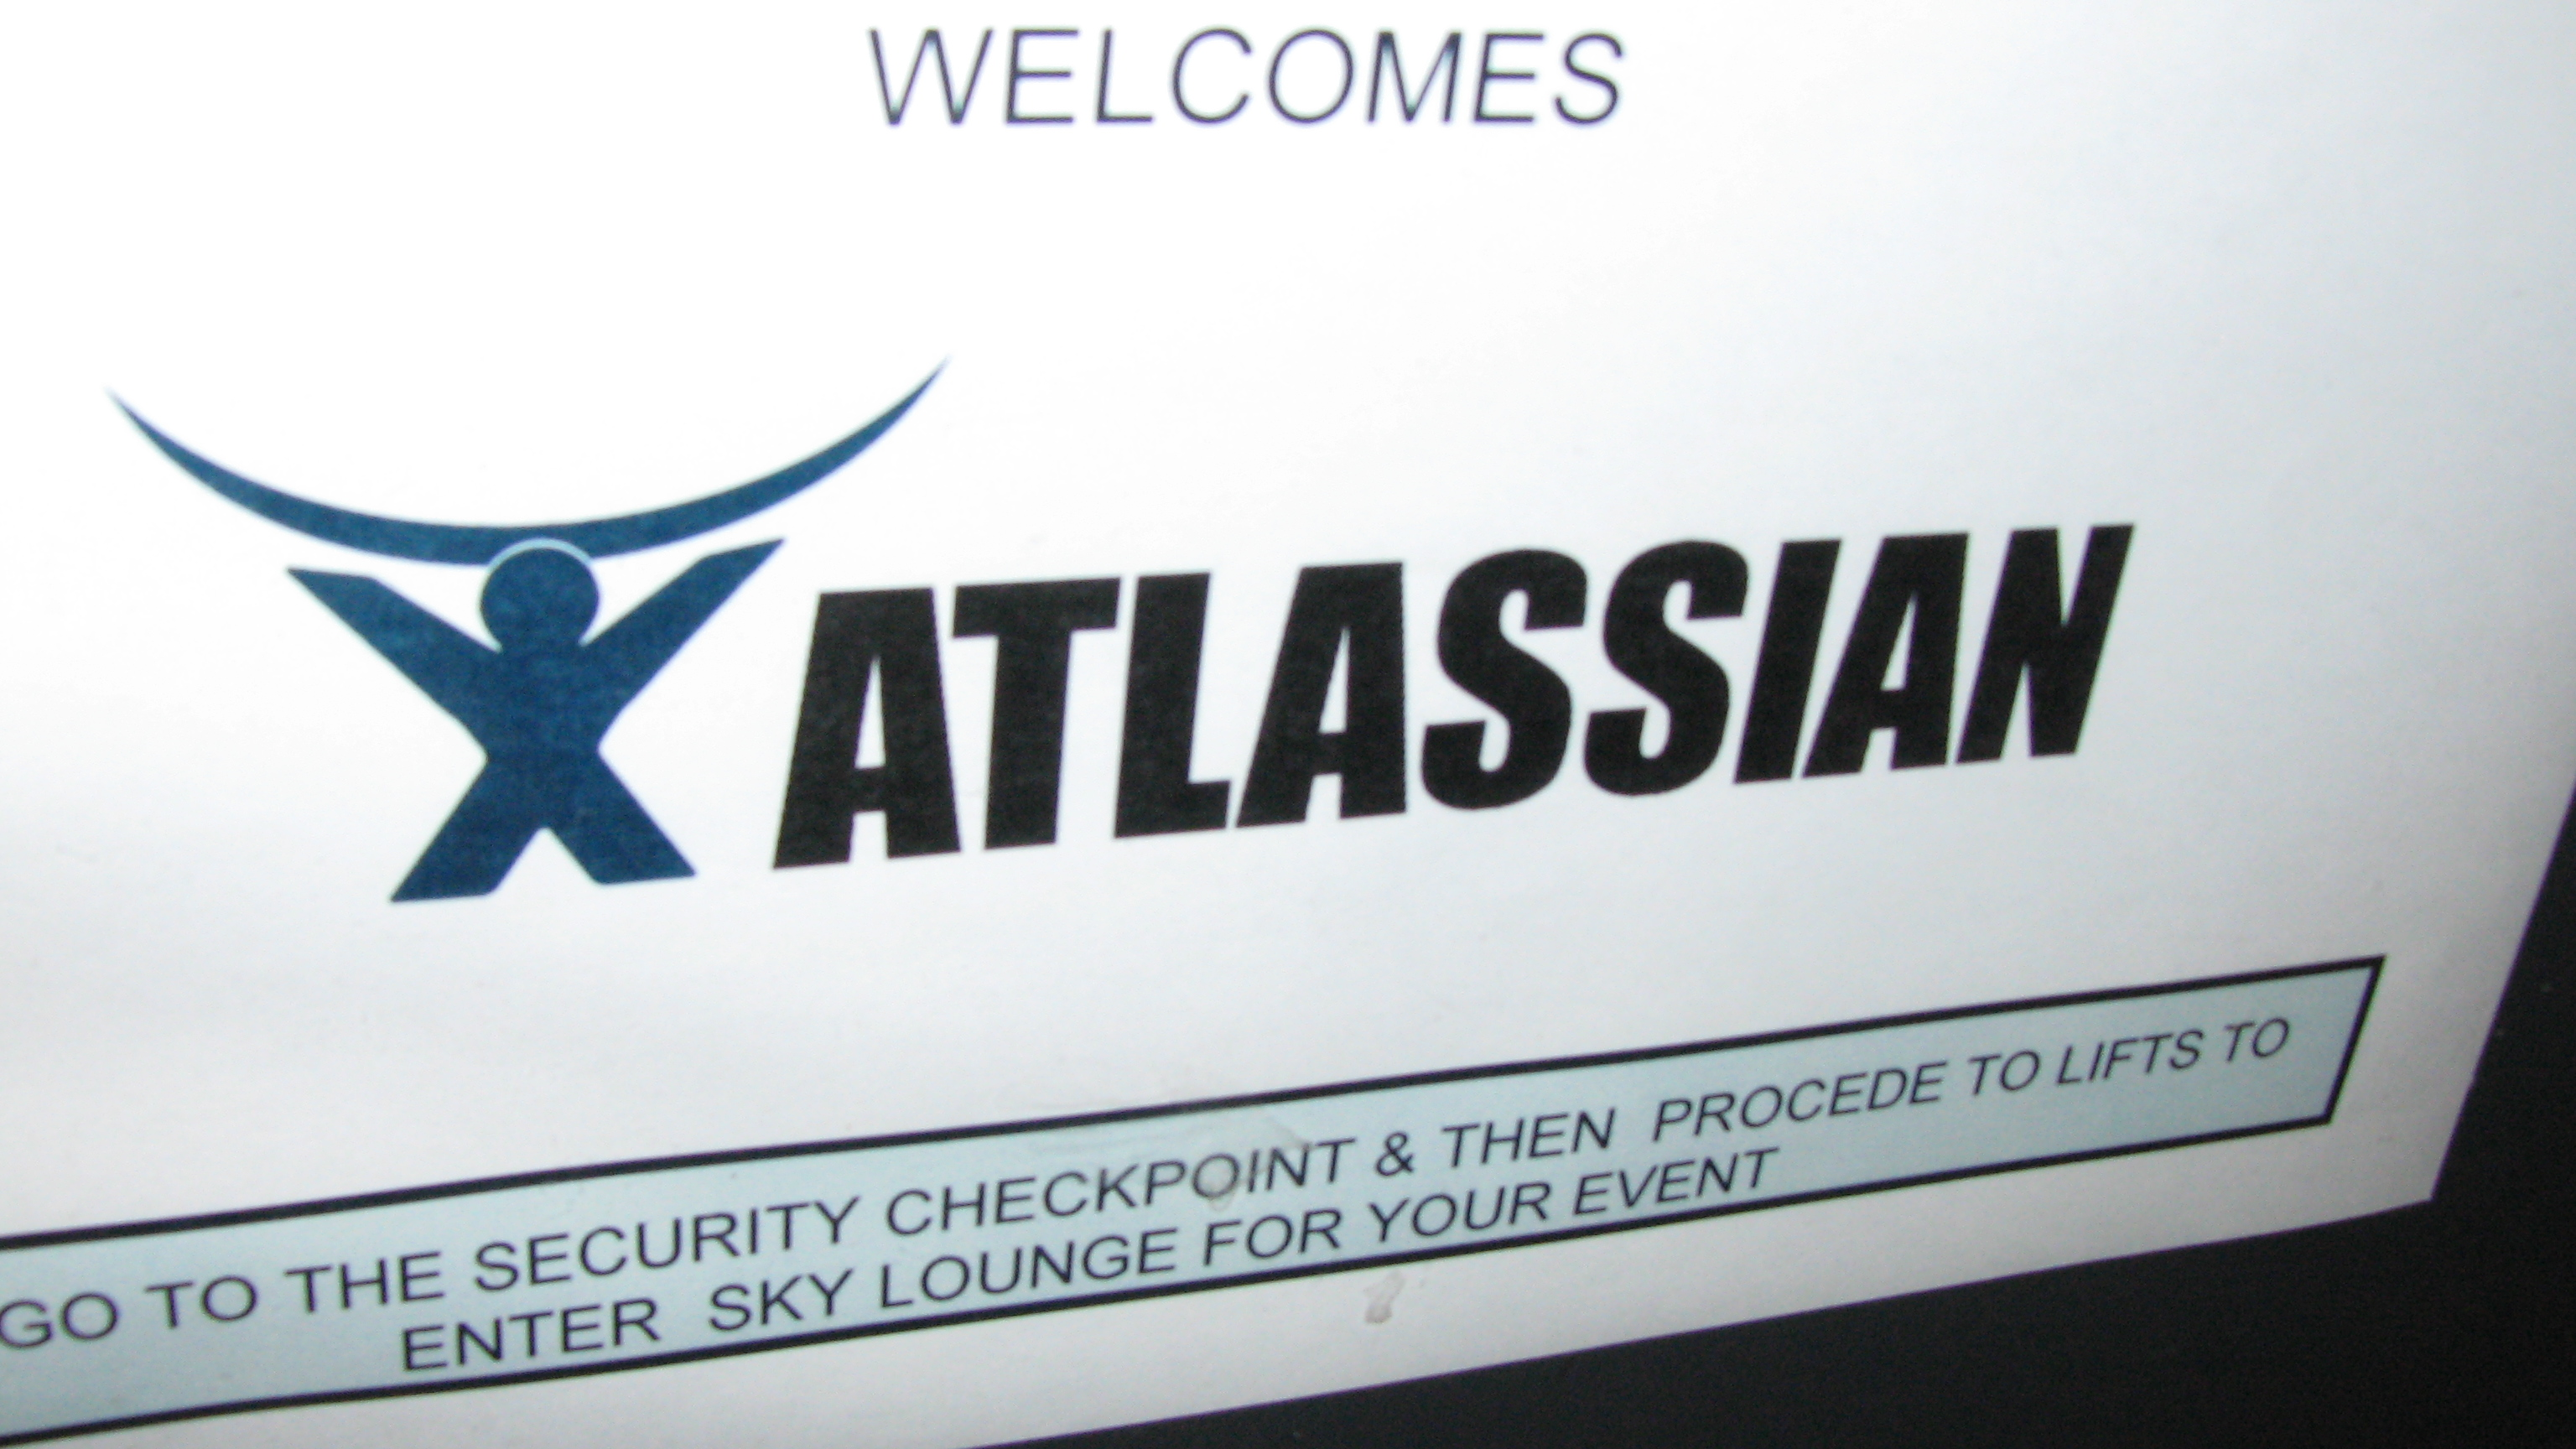 image of an Atlassian event -- CC image by Dmitry Baranovskiy -> https://www.flickr.com/photos/dmitry-baranovskiy/